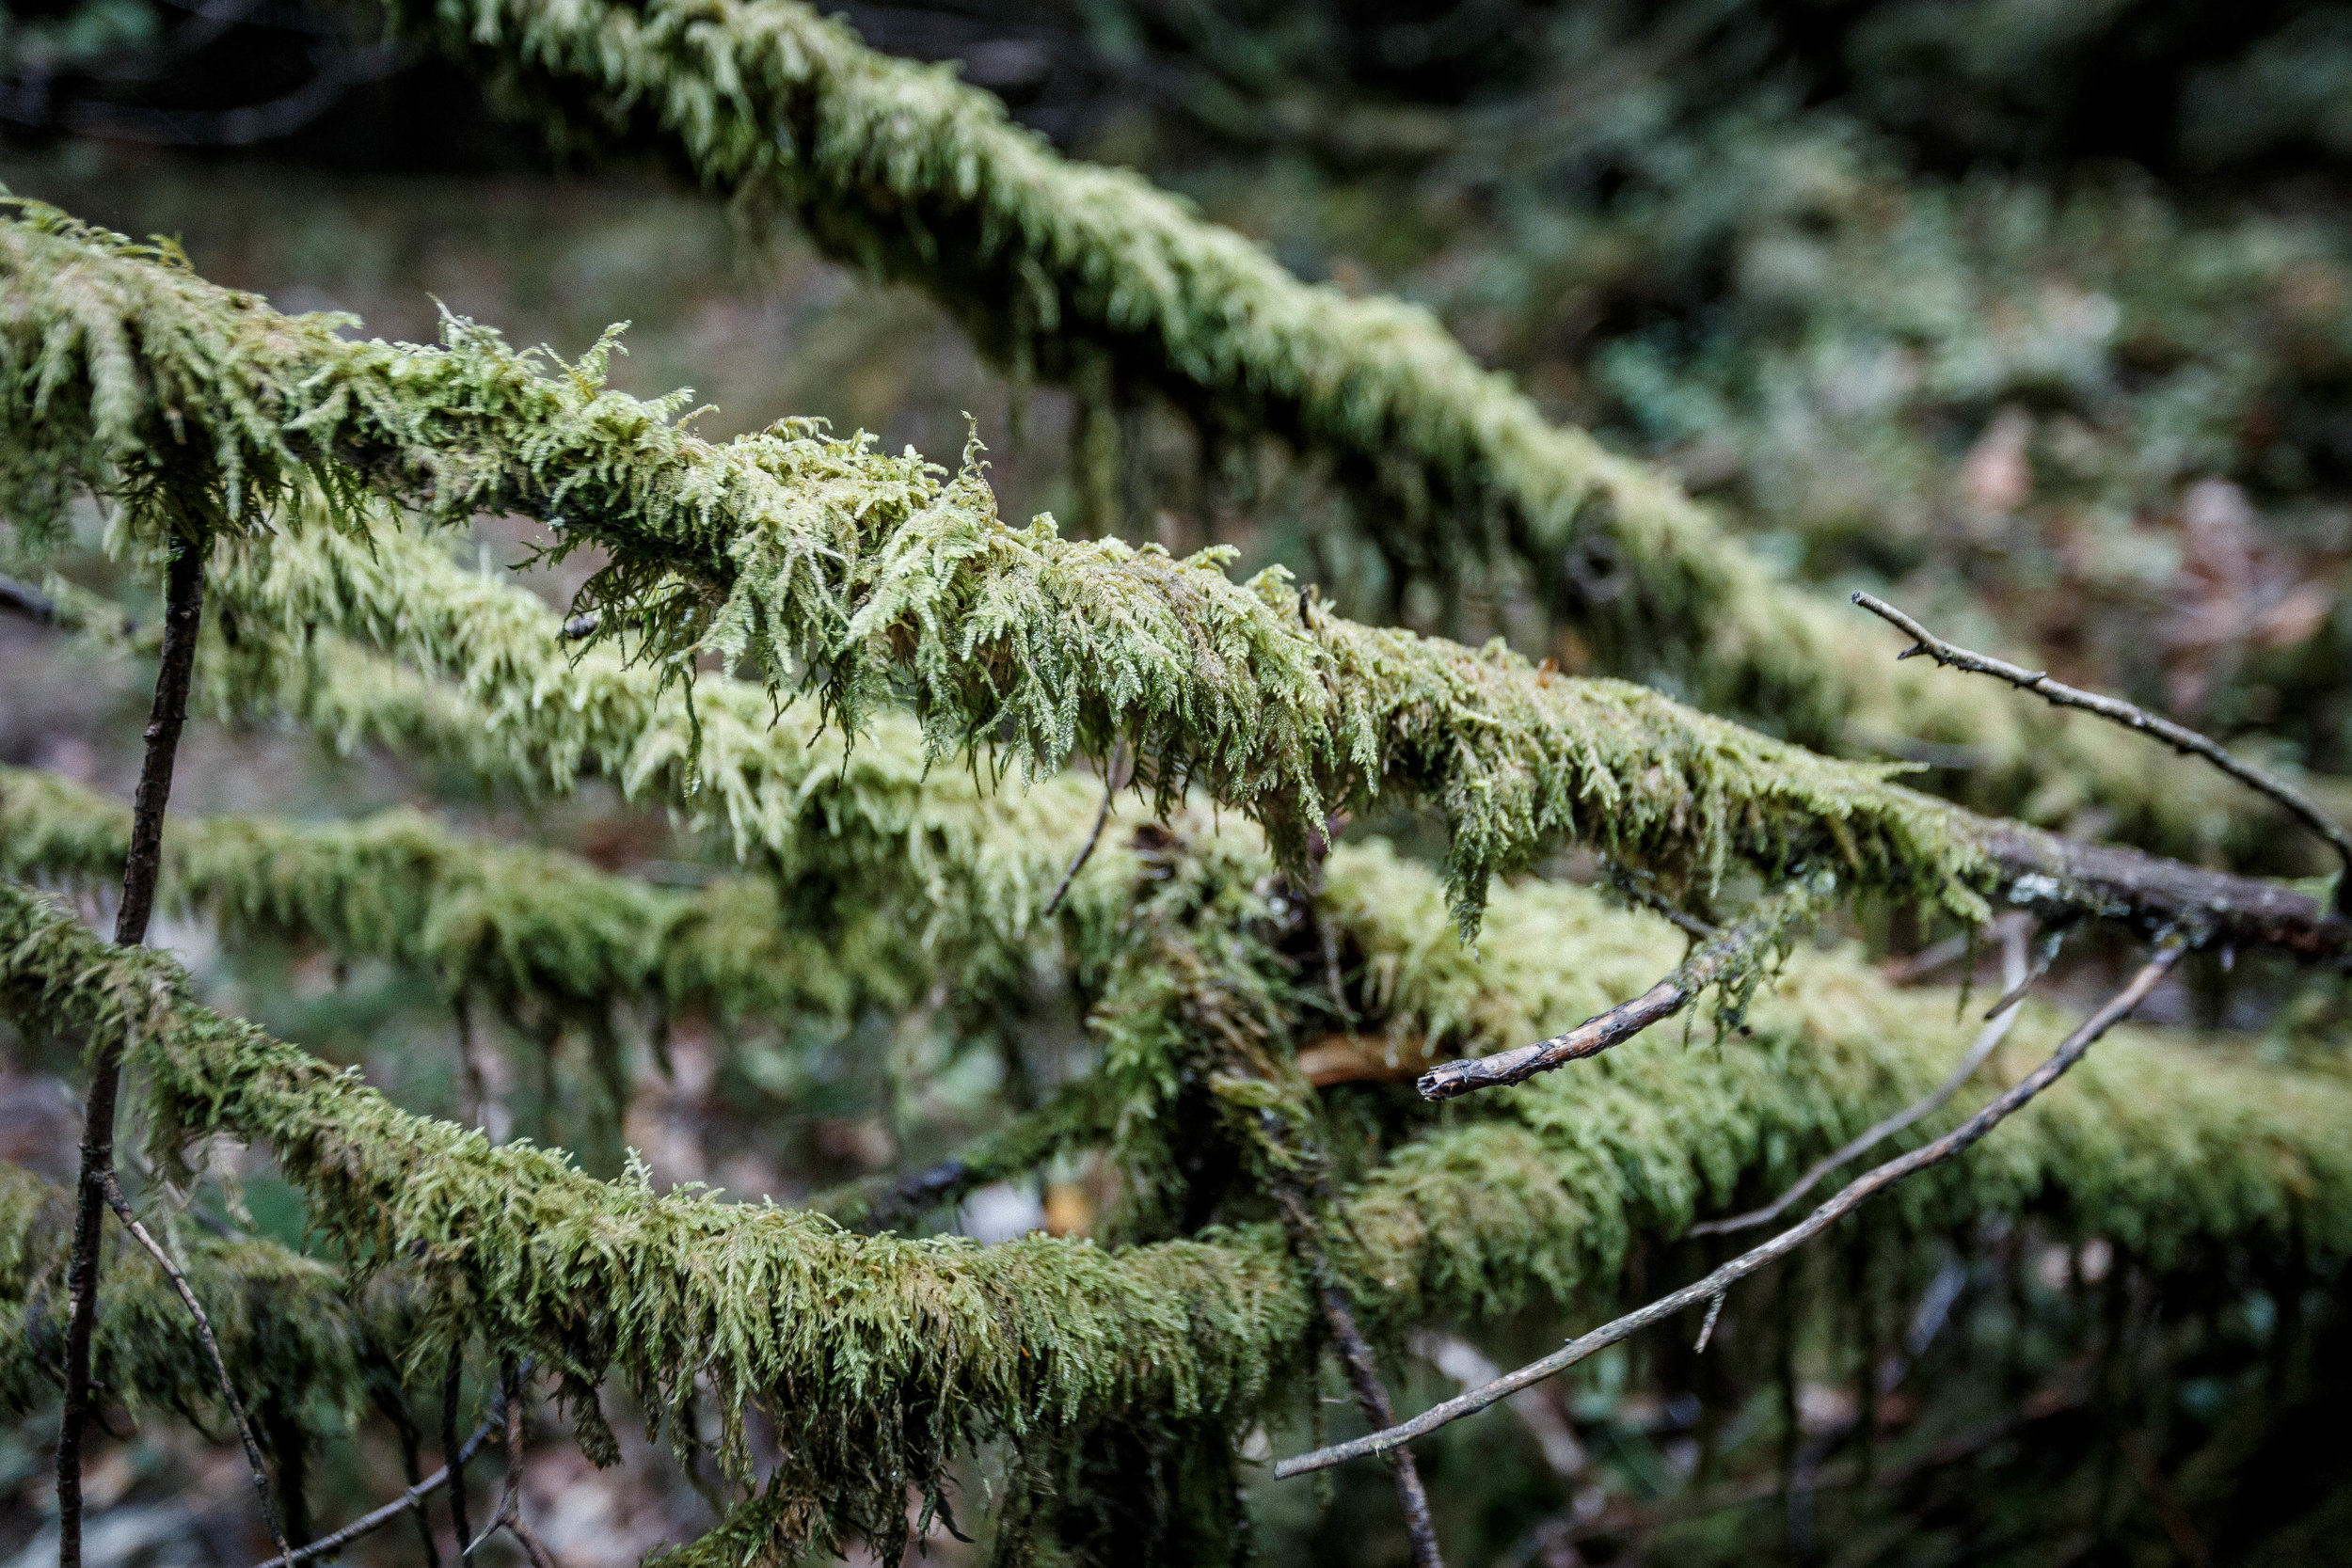 North_forest_10.jpg